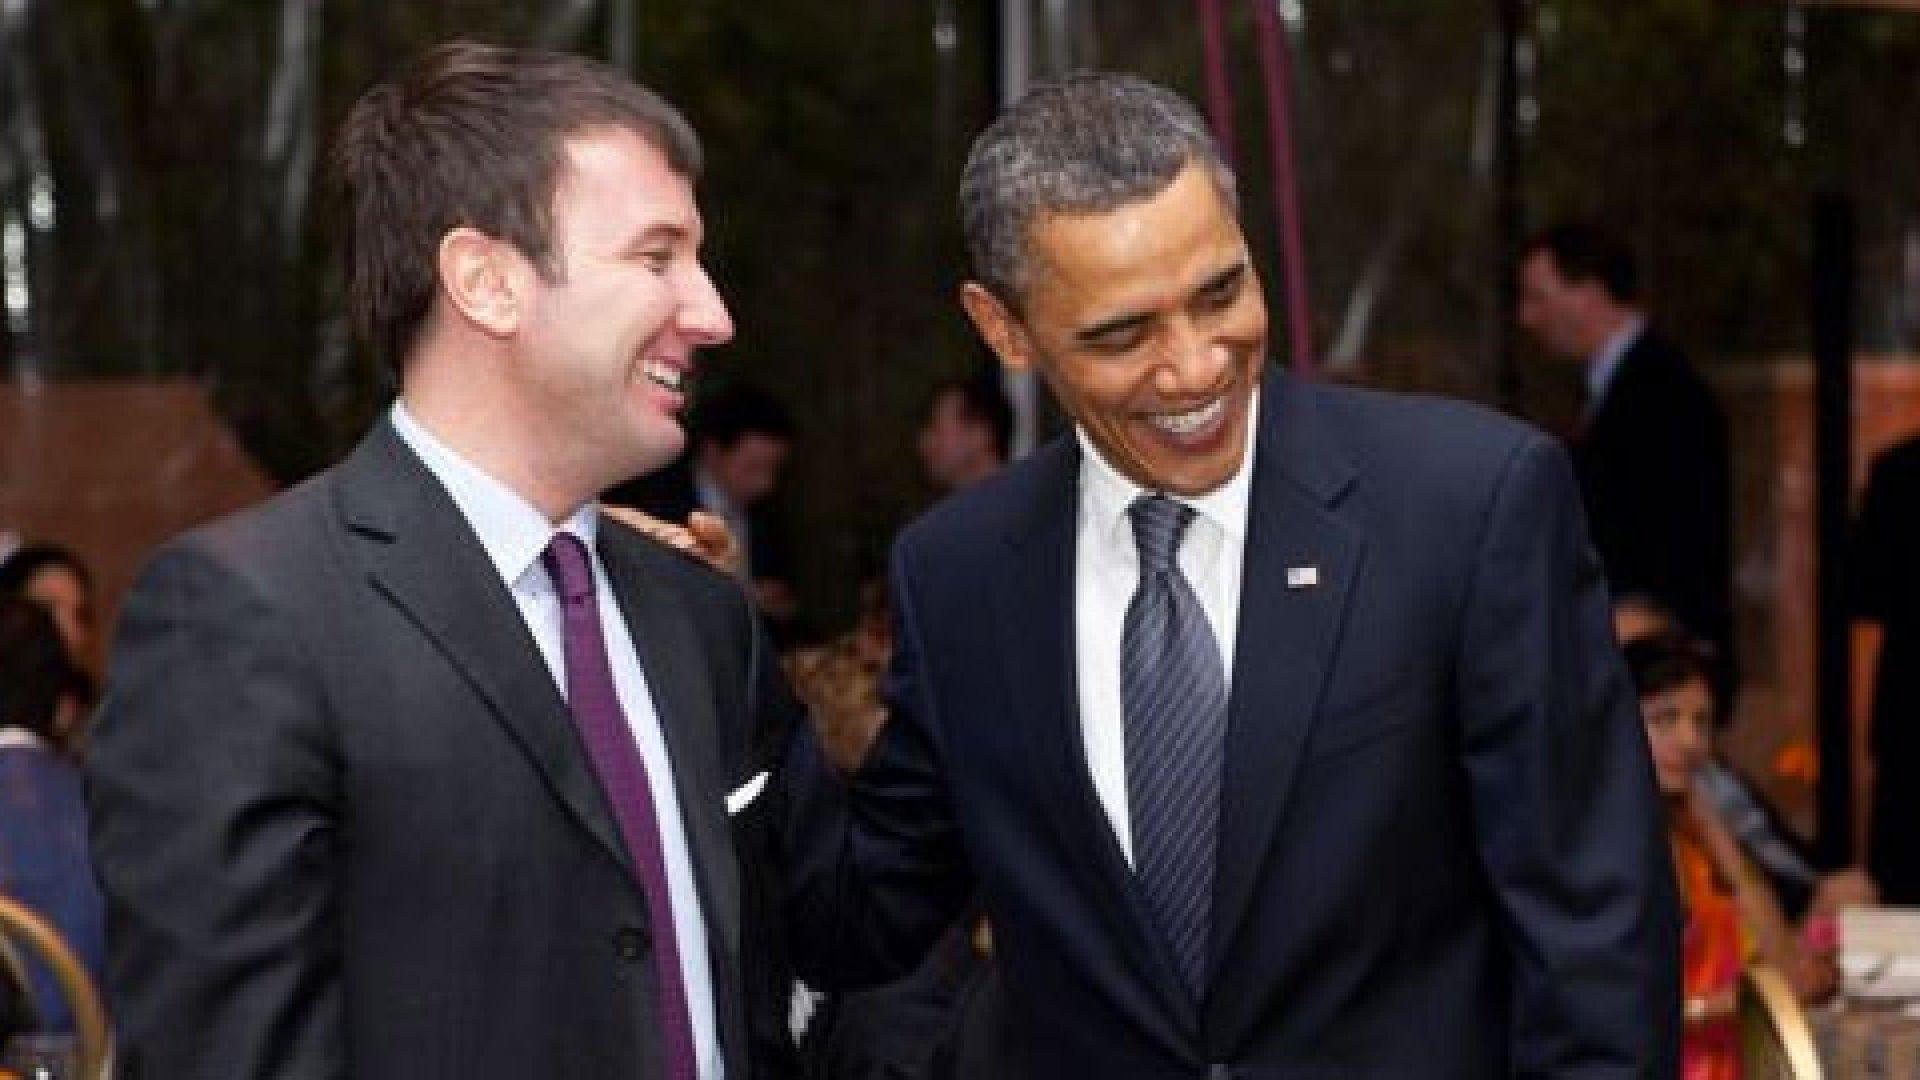 Jon Burgstone, managing director at Symbol Capital, with President Barack Obama